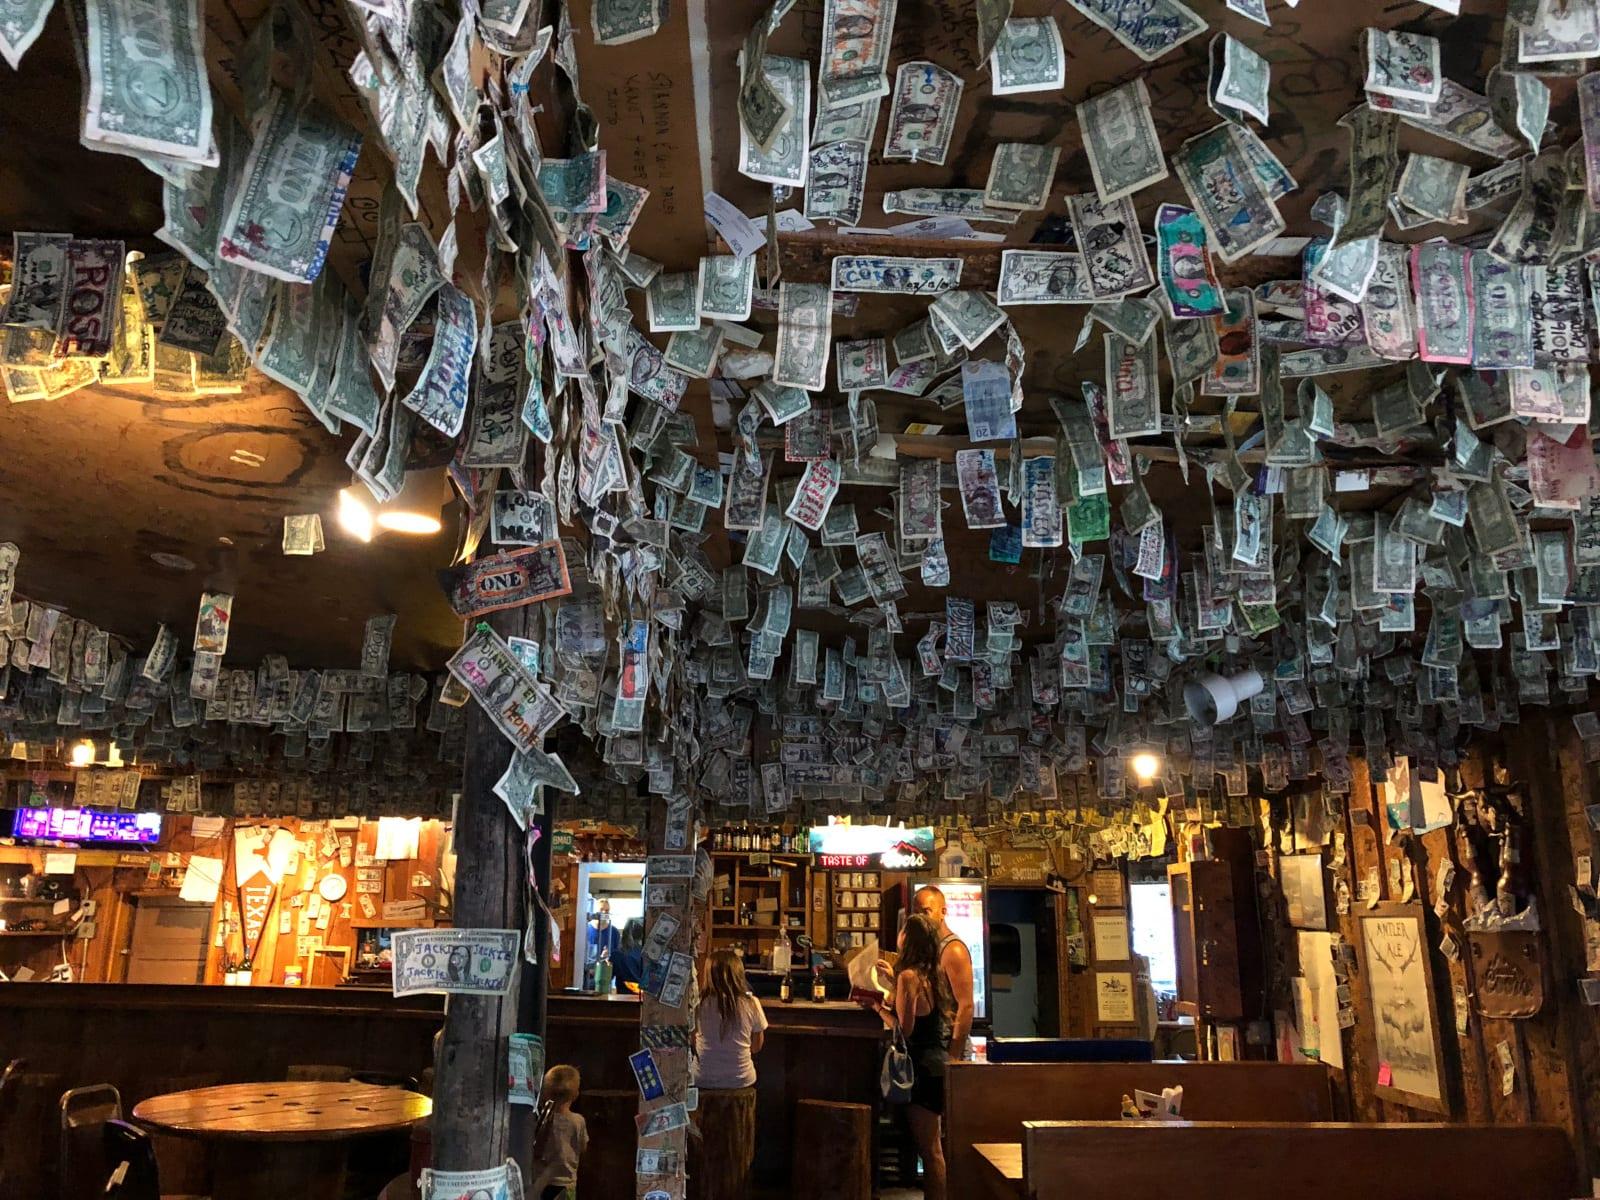 Pine CO Bucksnort Saloon Ceiling Dollar Bills